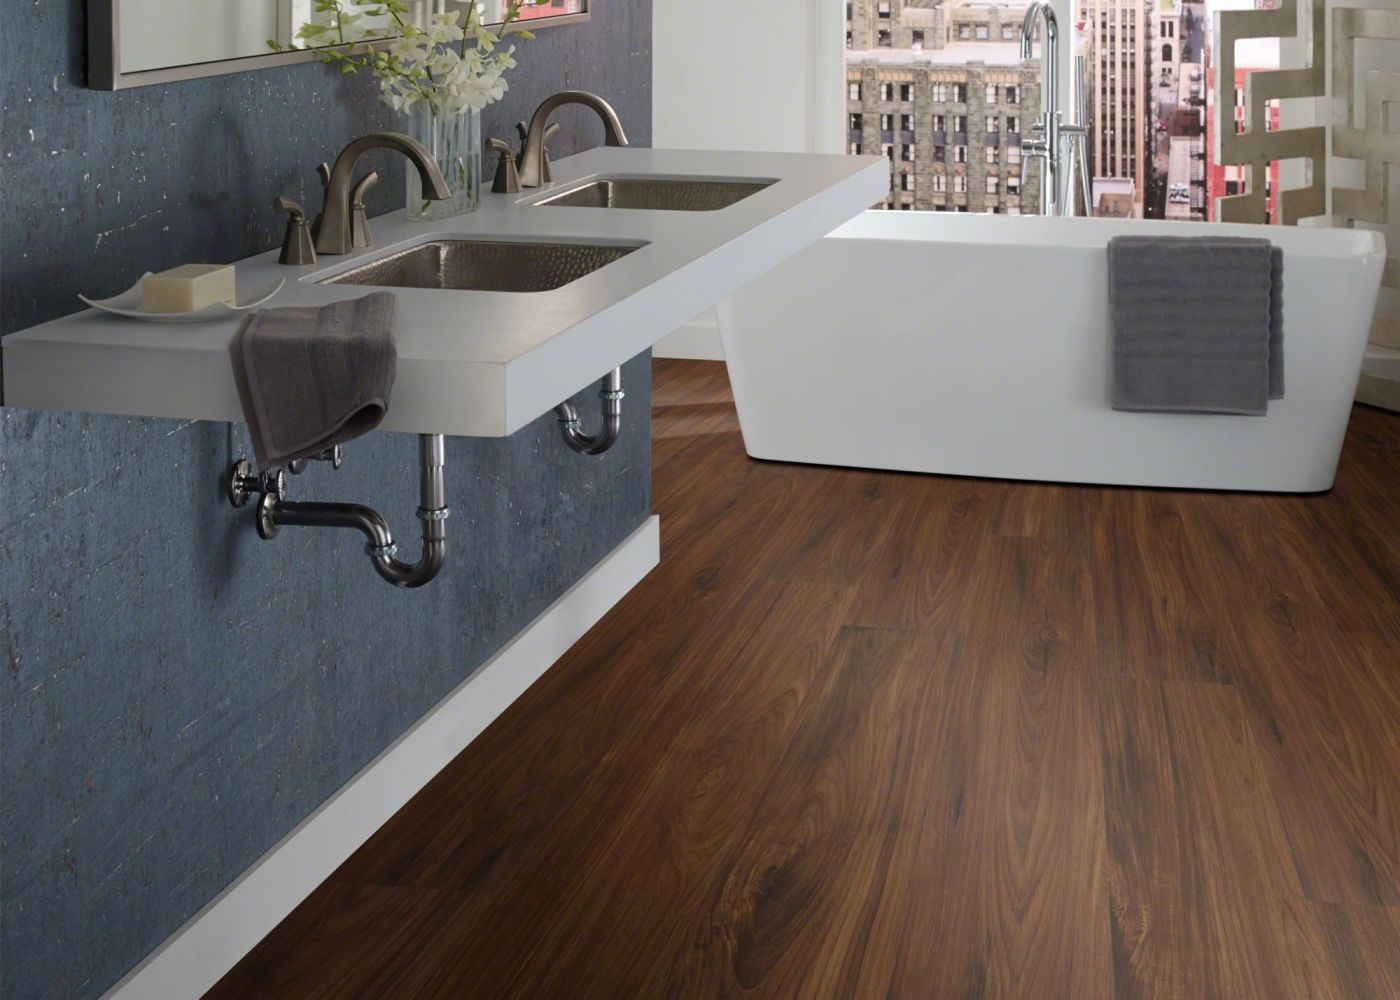 Shaw Floors Vinyl Residential Prime Plank Deep Mahogany 00703_0616V